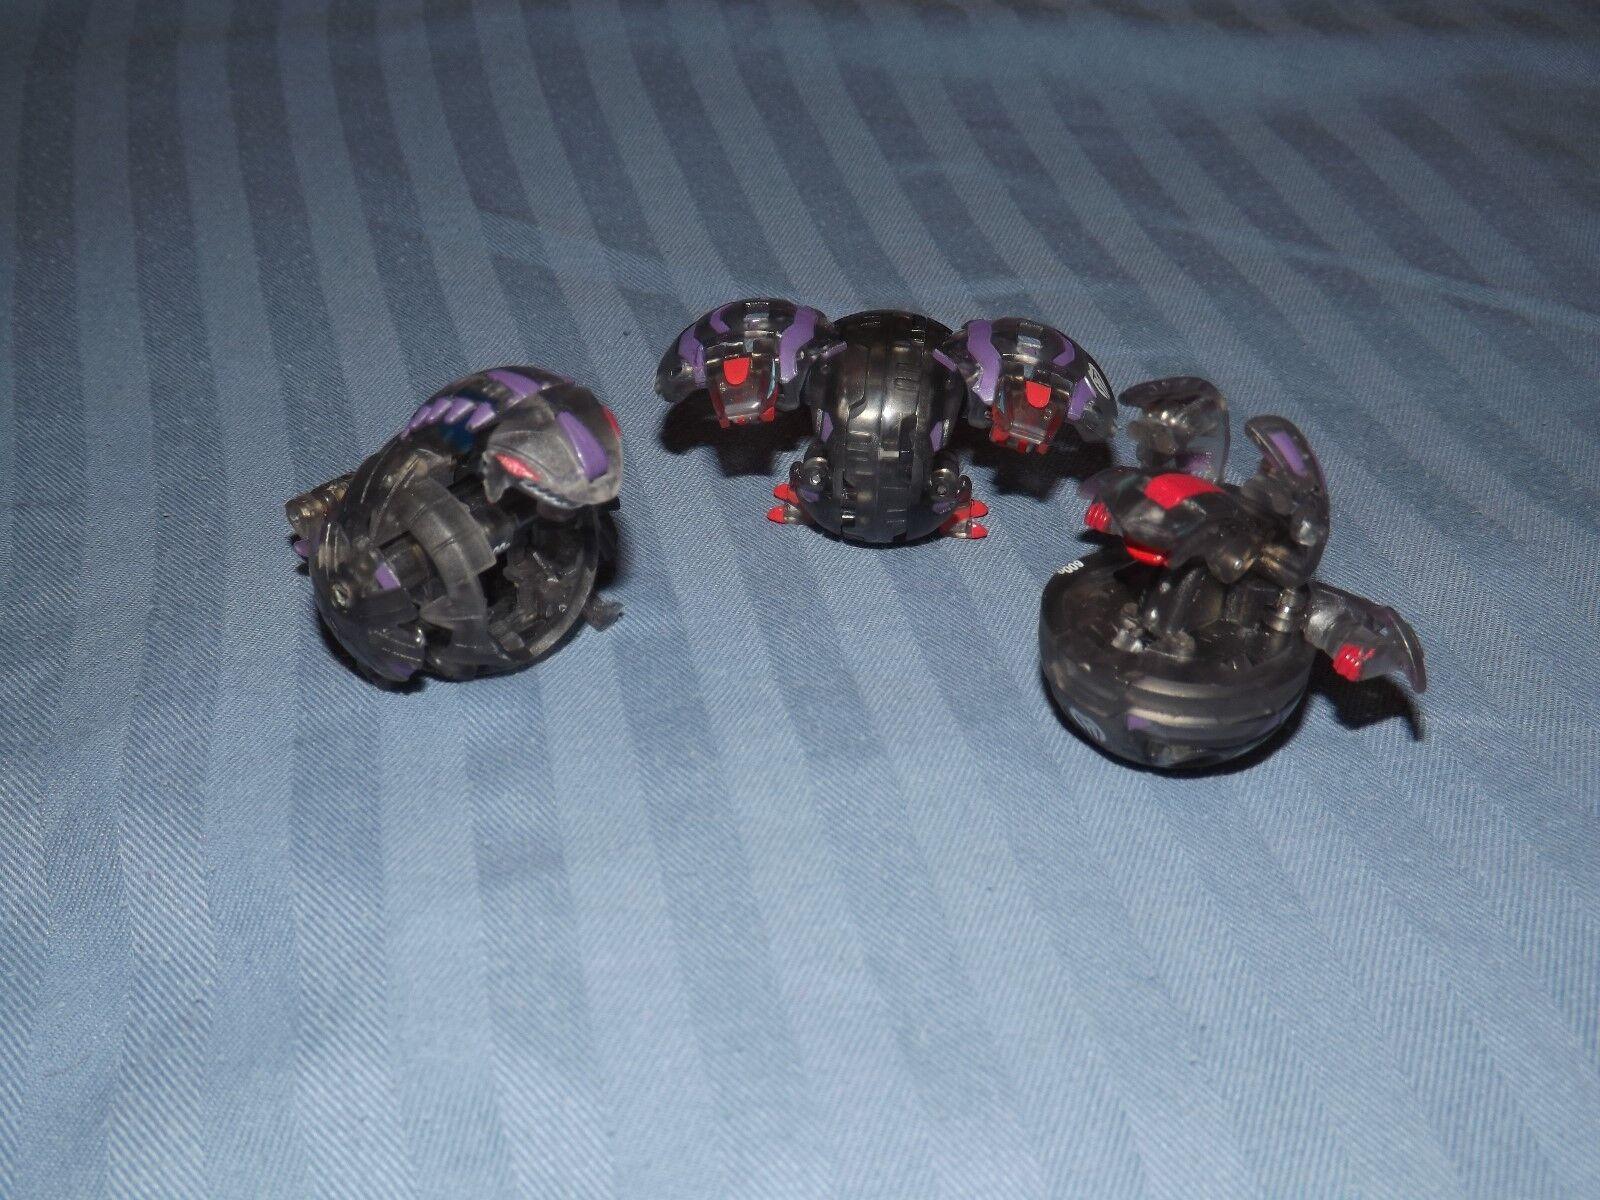 Bakugan Translucent Darkus Hydranoid Evolution Ltd Ed Masquerade 3 VERY RARE